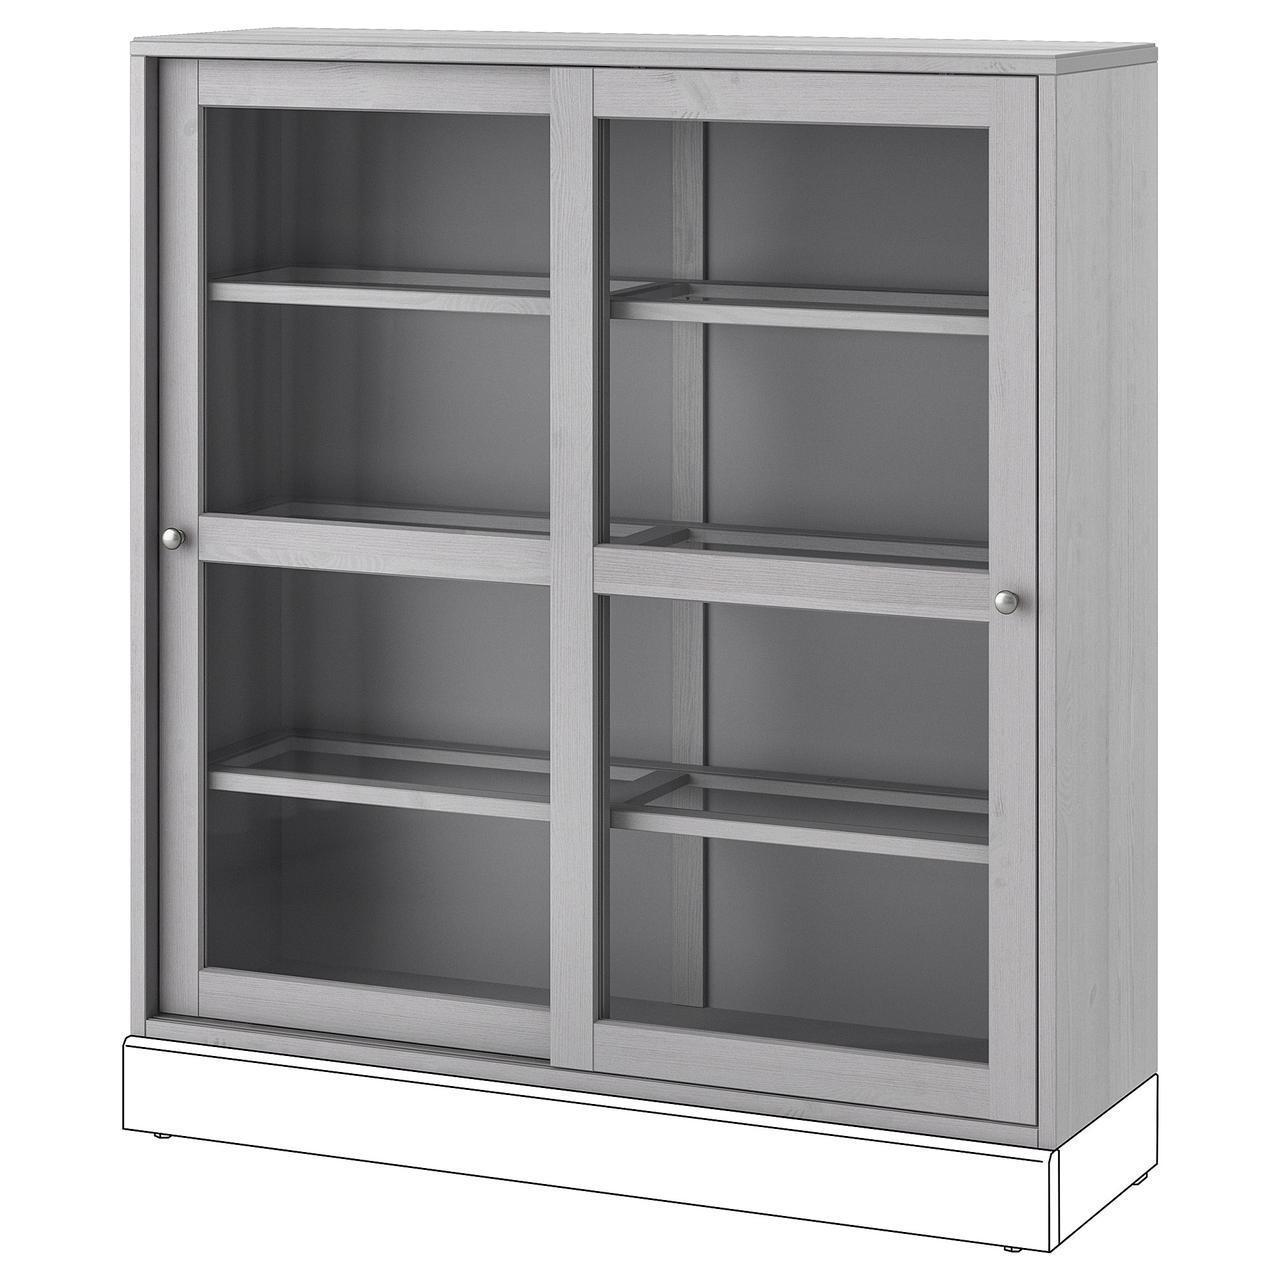 Сервант IKEA HAVSTA 121x123x35 см серый 504.221.73